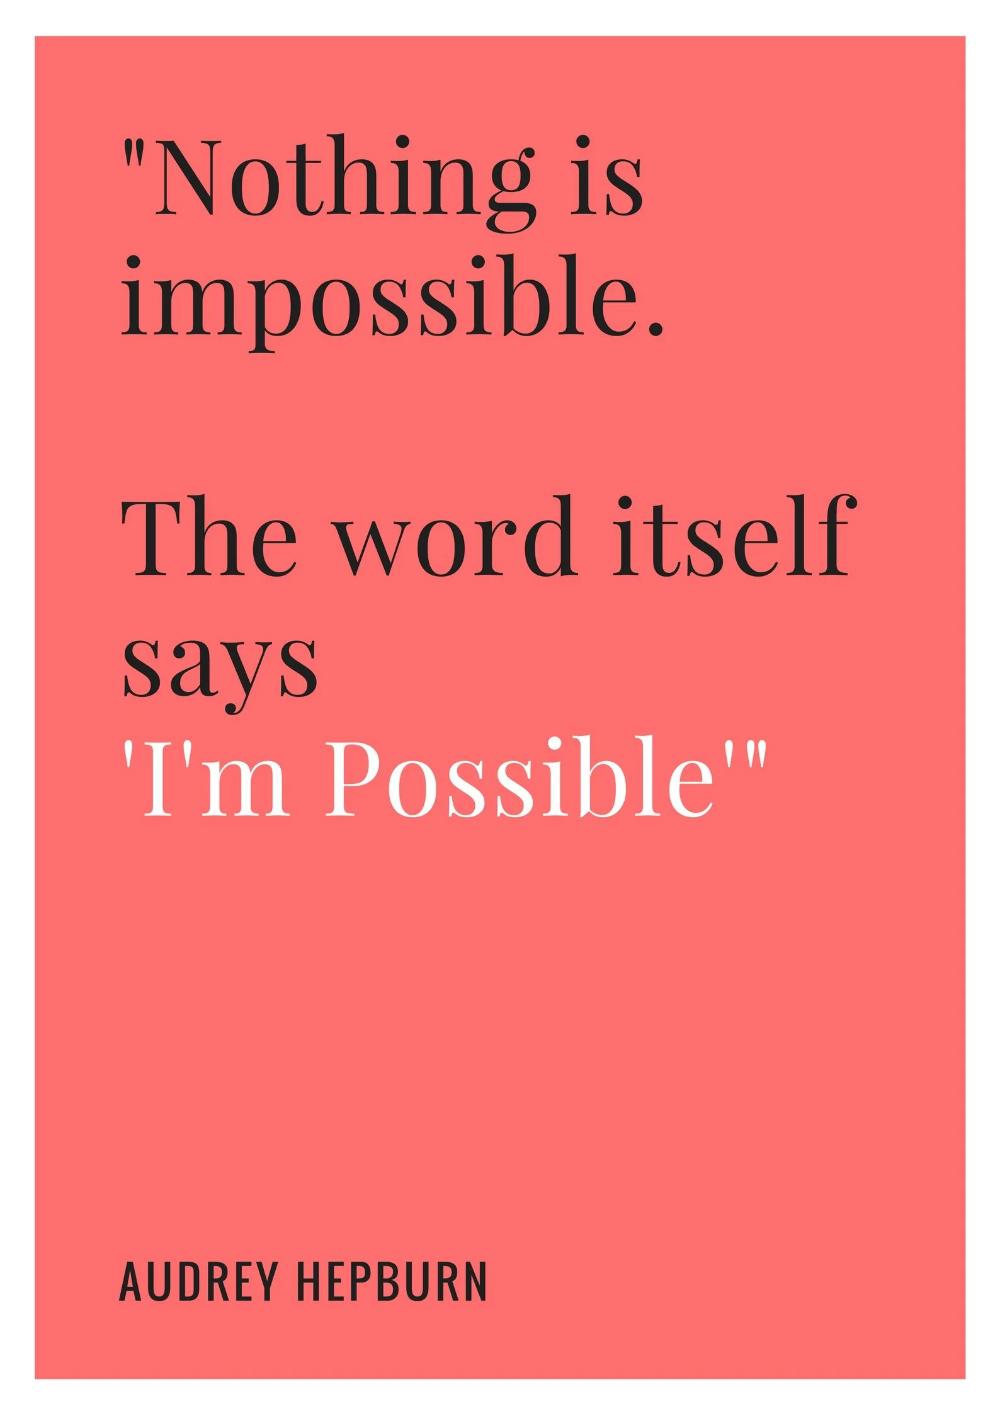 Motivational Quotes Student Hut Exam Quotes Motivational Quotes For Students Exam Motivation Quotes